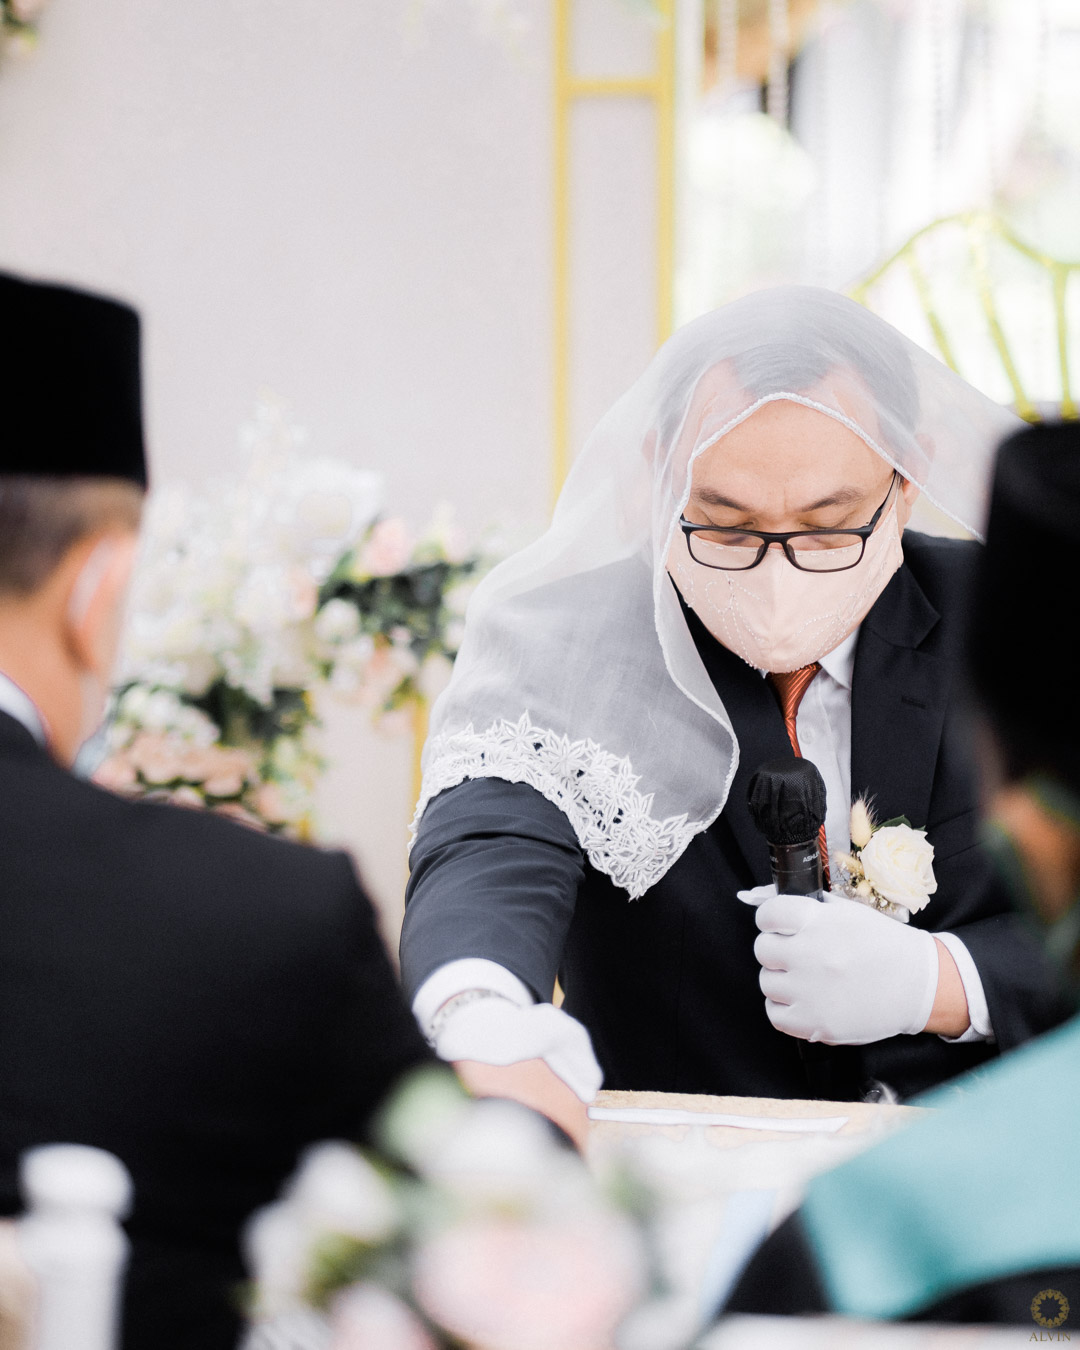 7 DSCF0307 : New Normal Wedding Ceremony